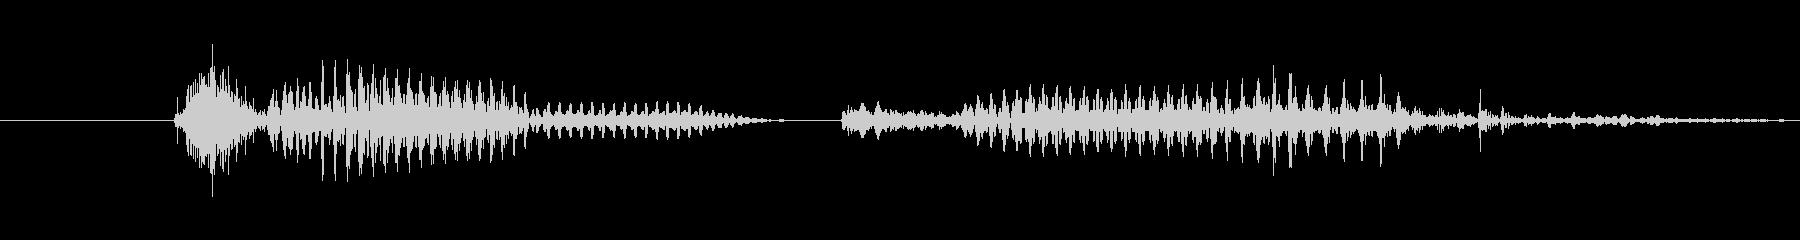 「10 PM」英語発音の未再生の波形